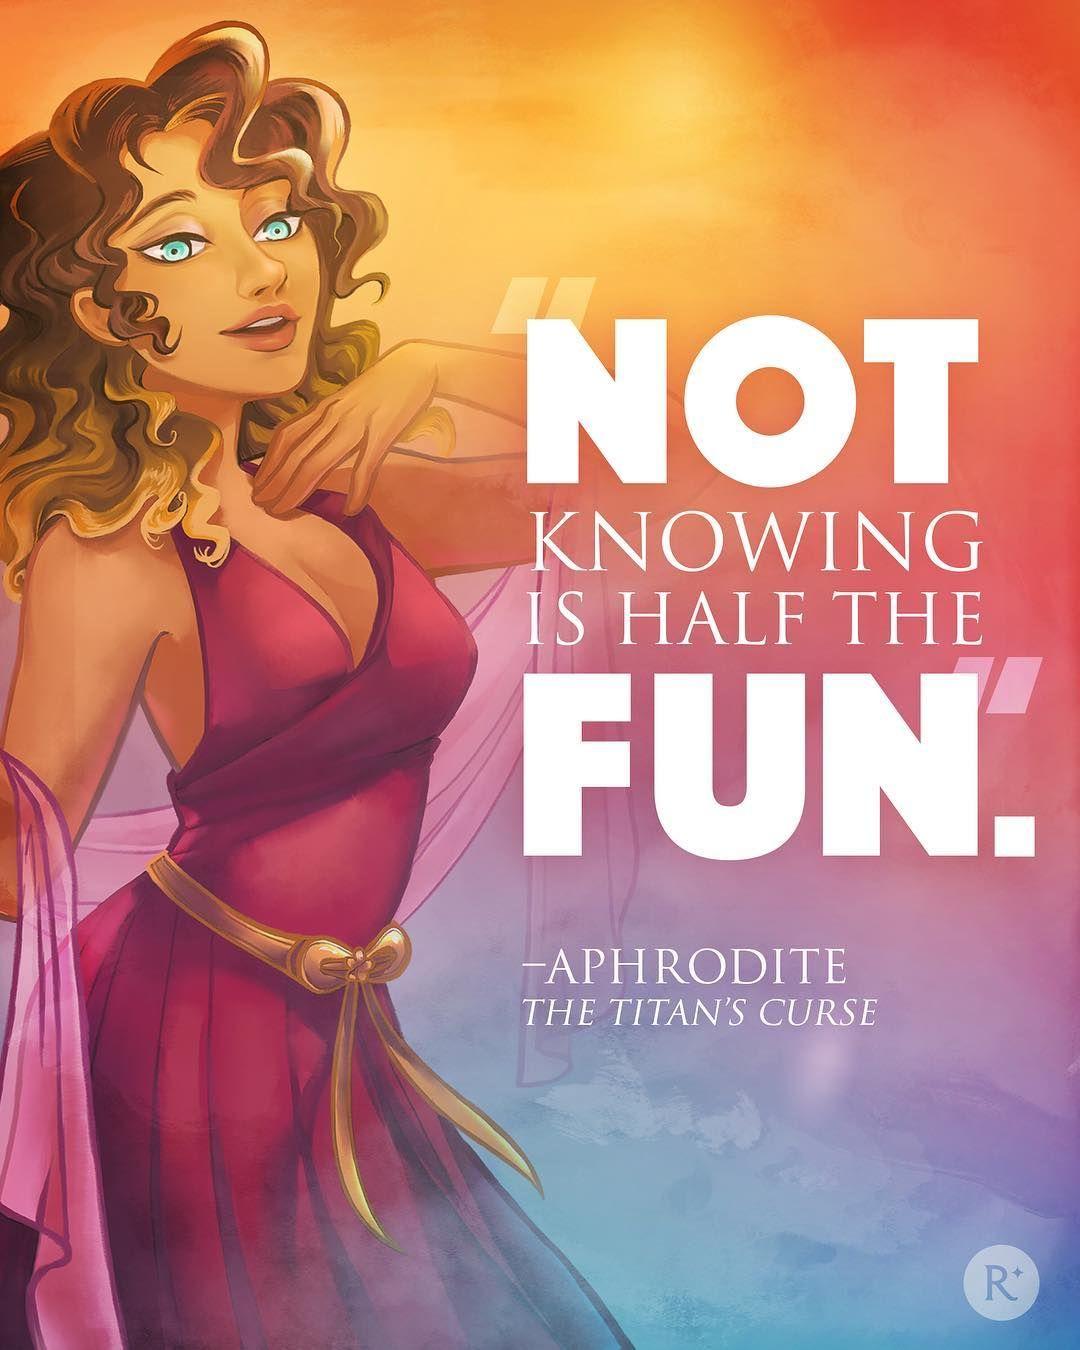 Aphrodite Quote The Titan S Curse Percy Jackson Quotes Percy Jackson Fandom Percy And Annabeth